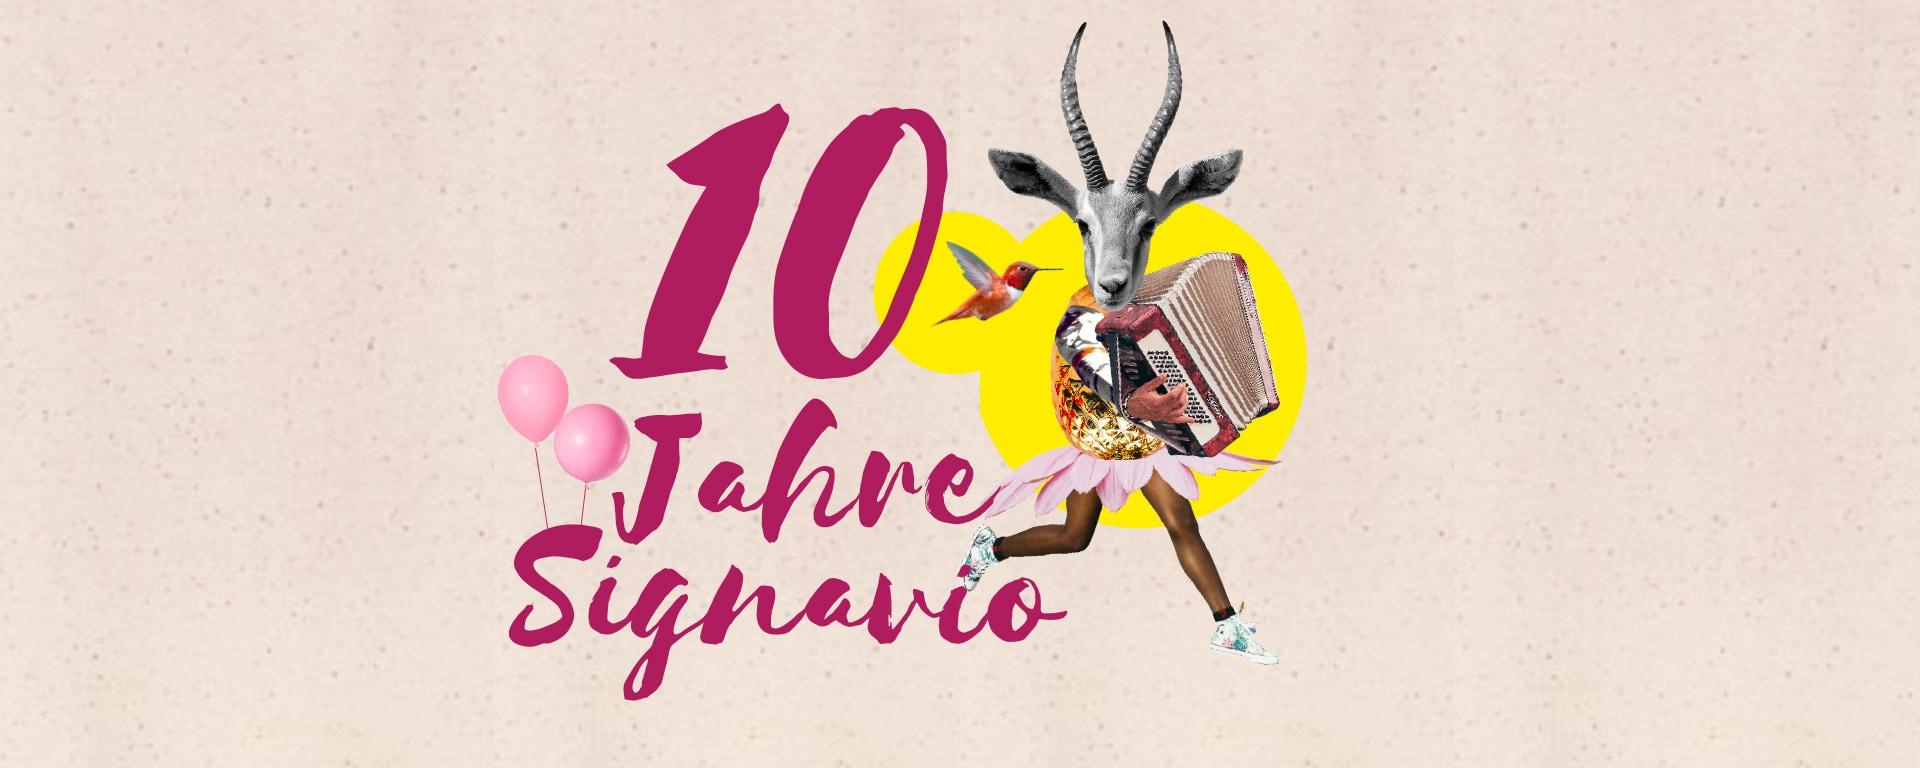 10 Jahre Signavio